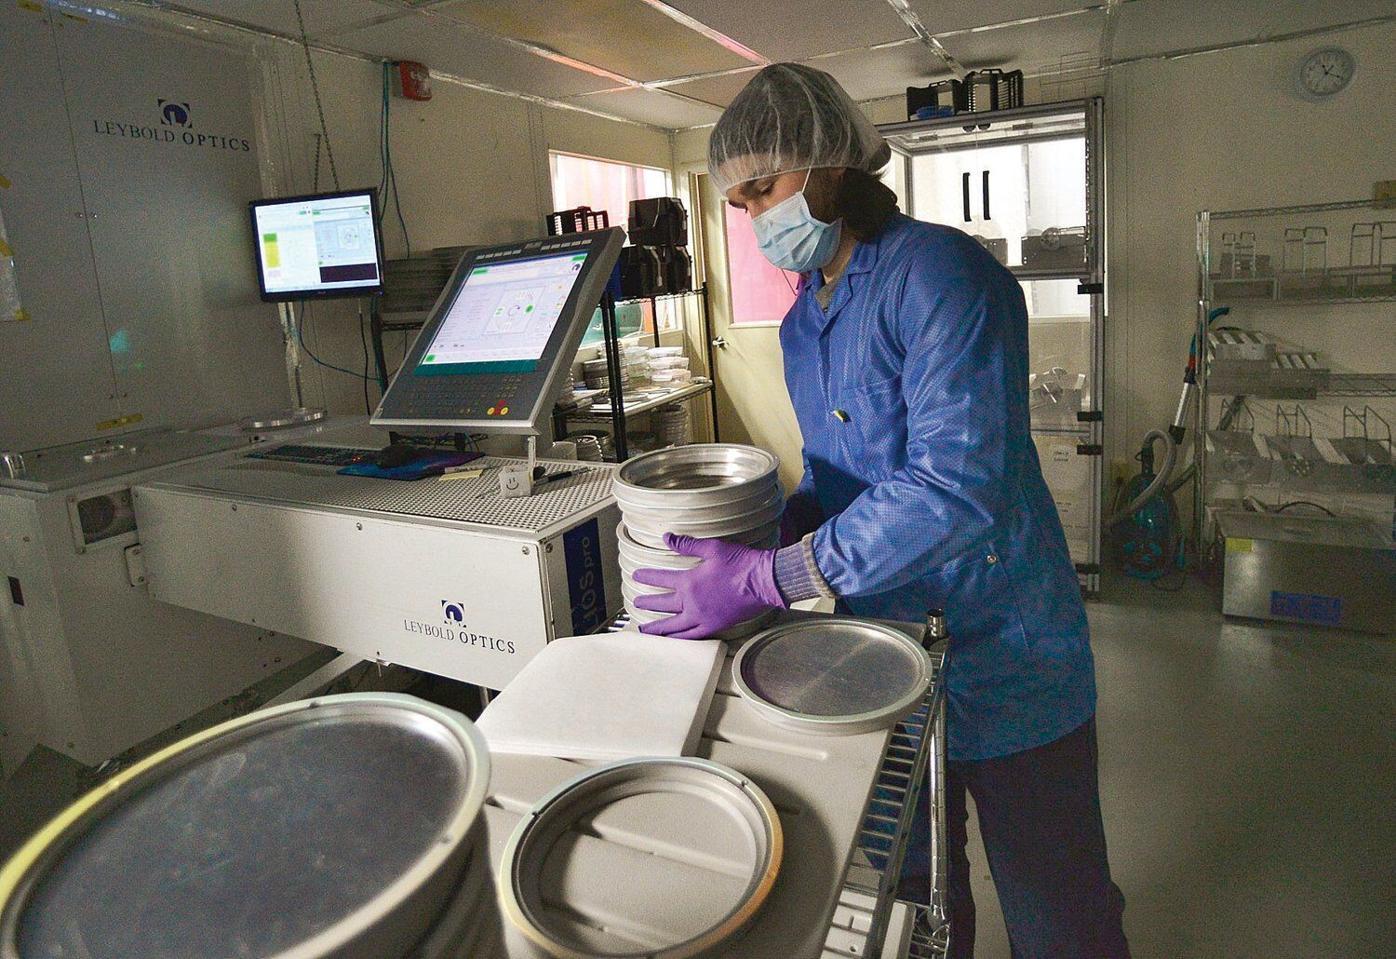 Chroma, Omega take center stage in coronavirus testing